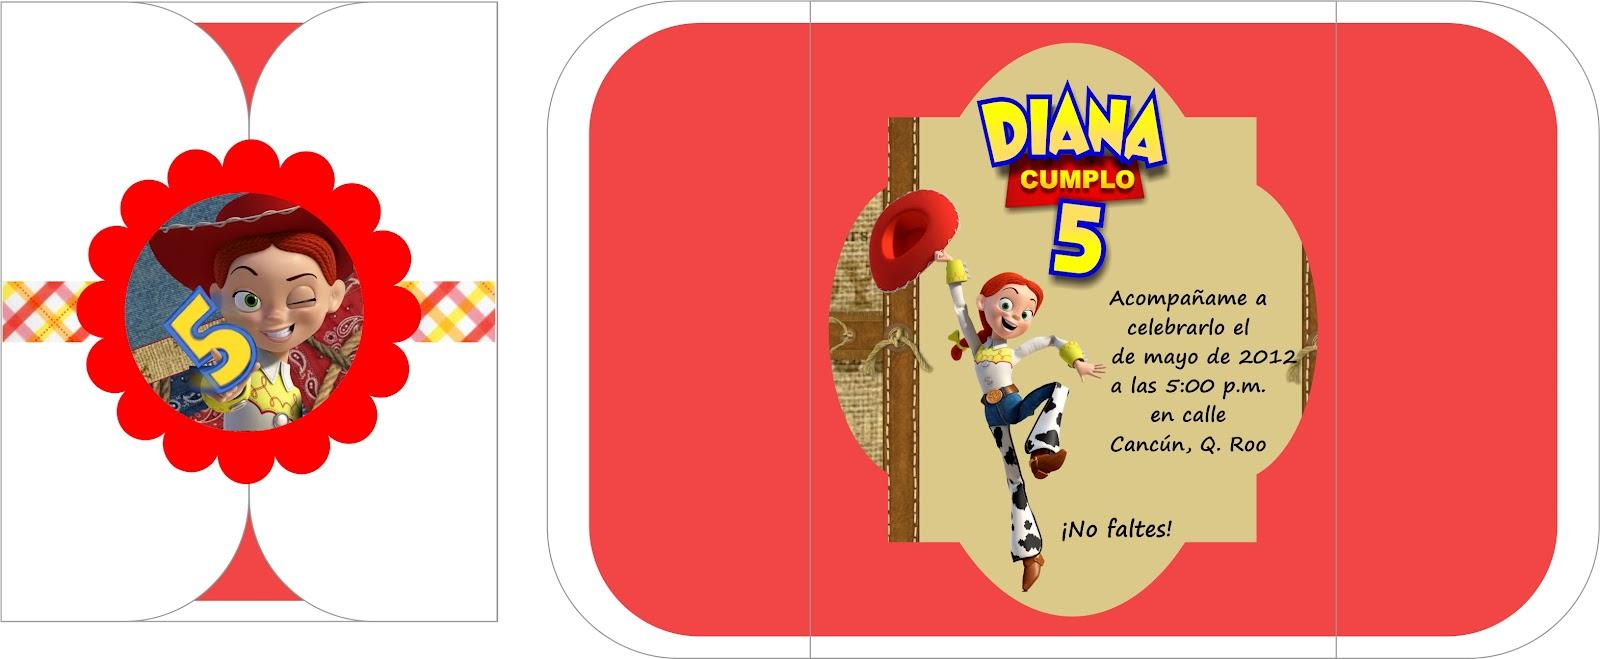 Invitaciones Jessie La Vaquerita Toy Story 3 Pictures